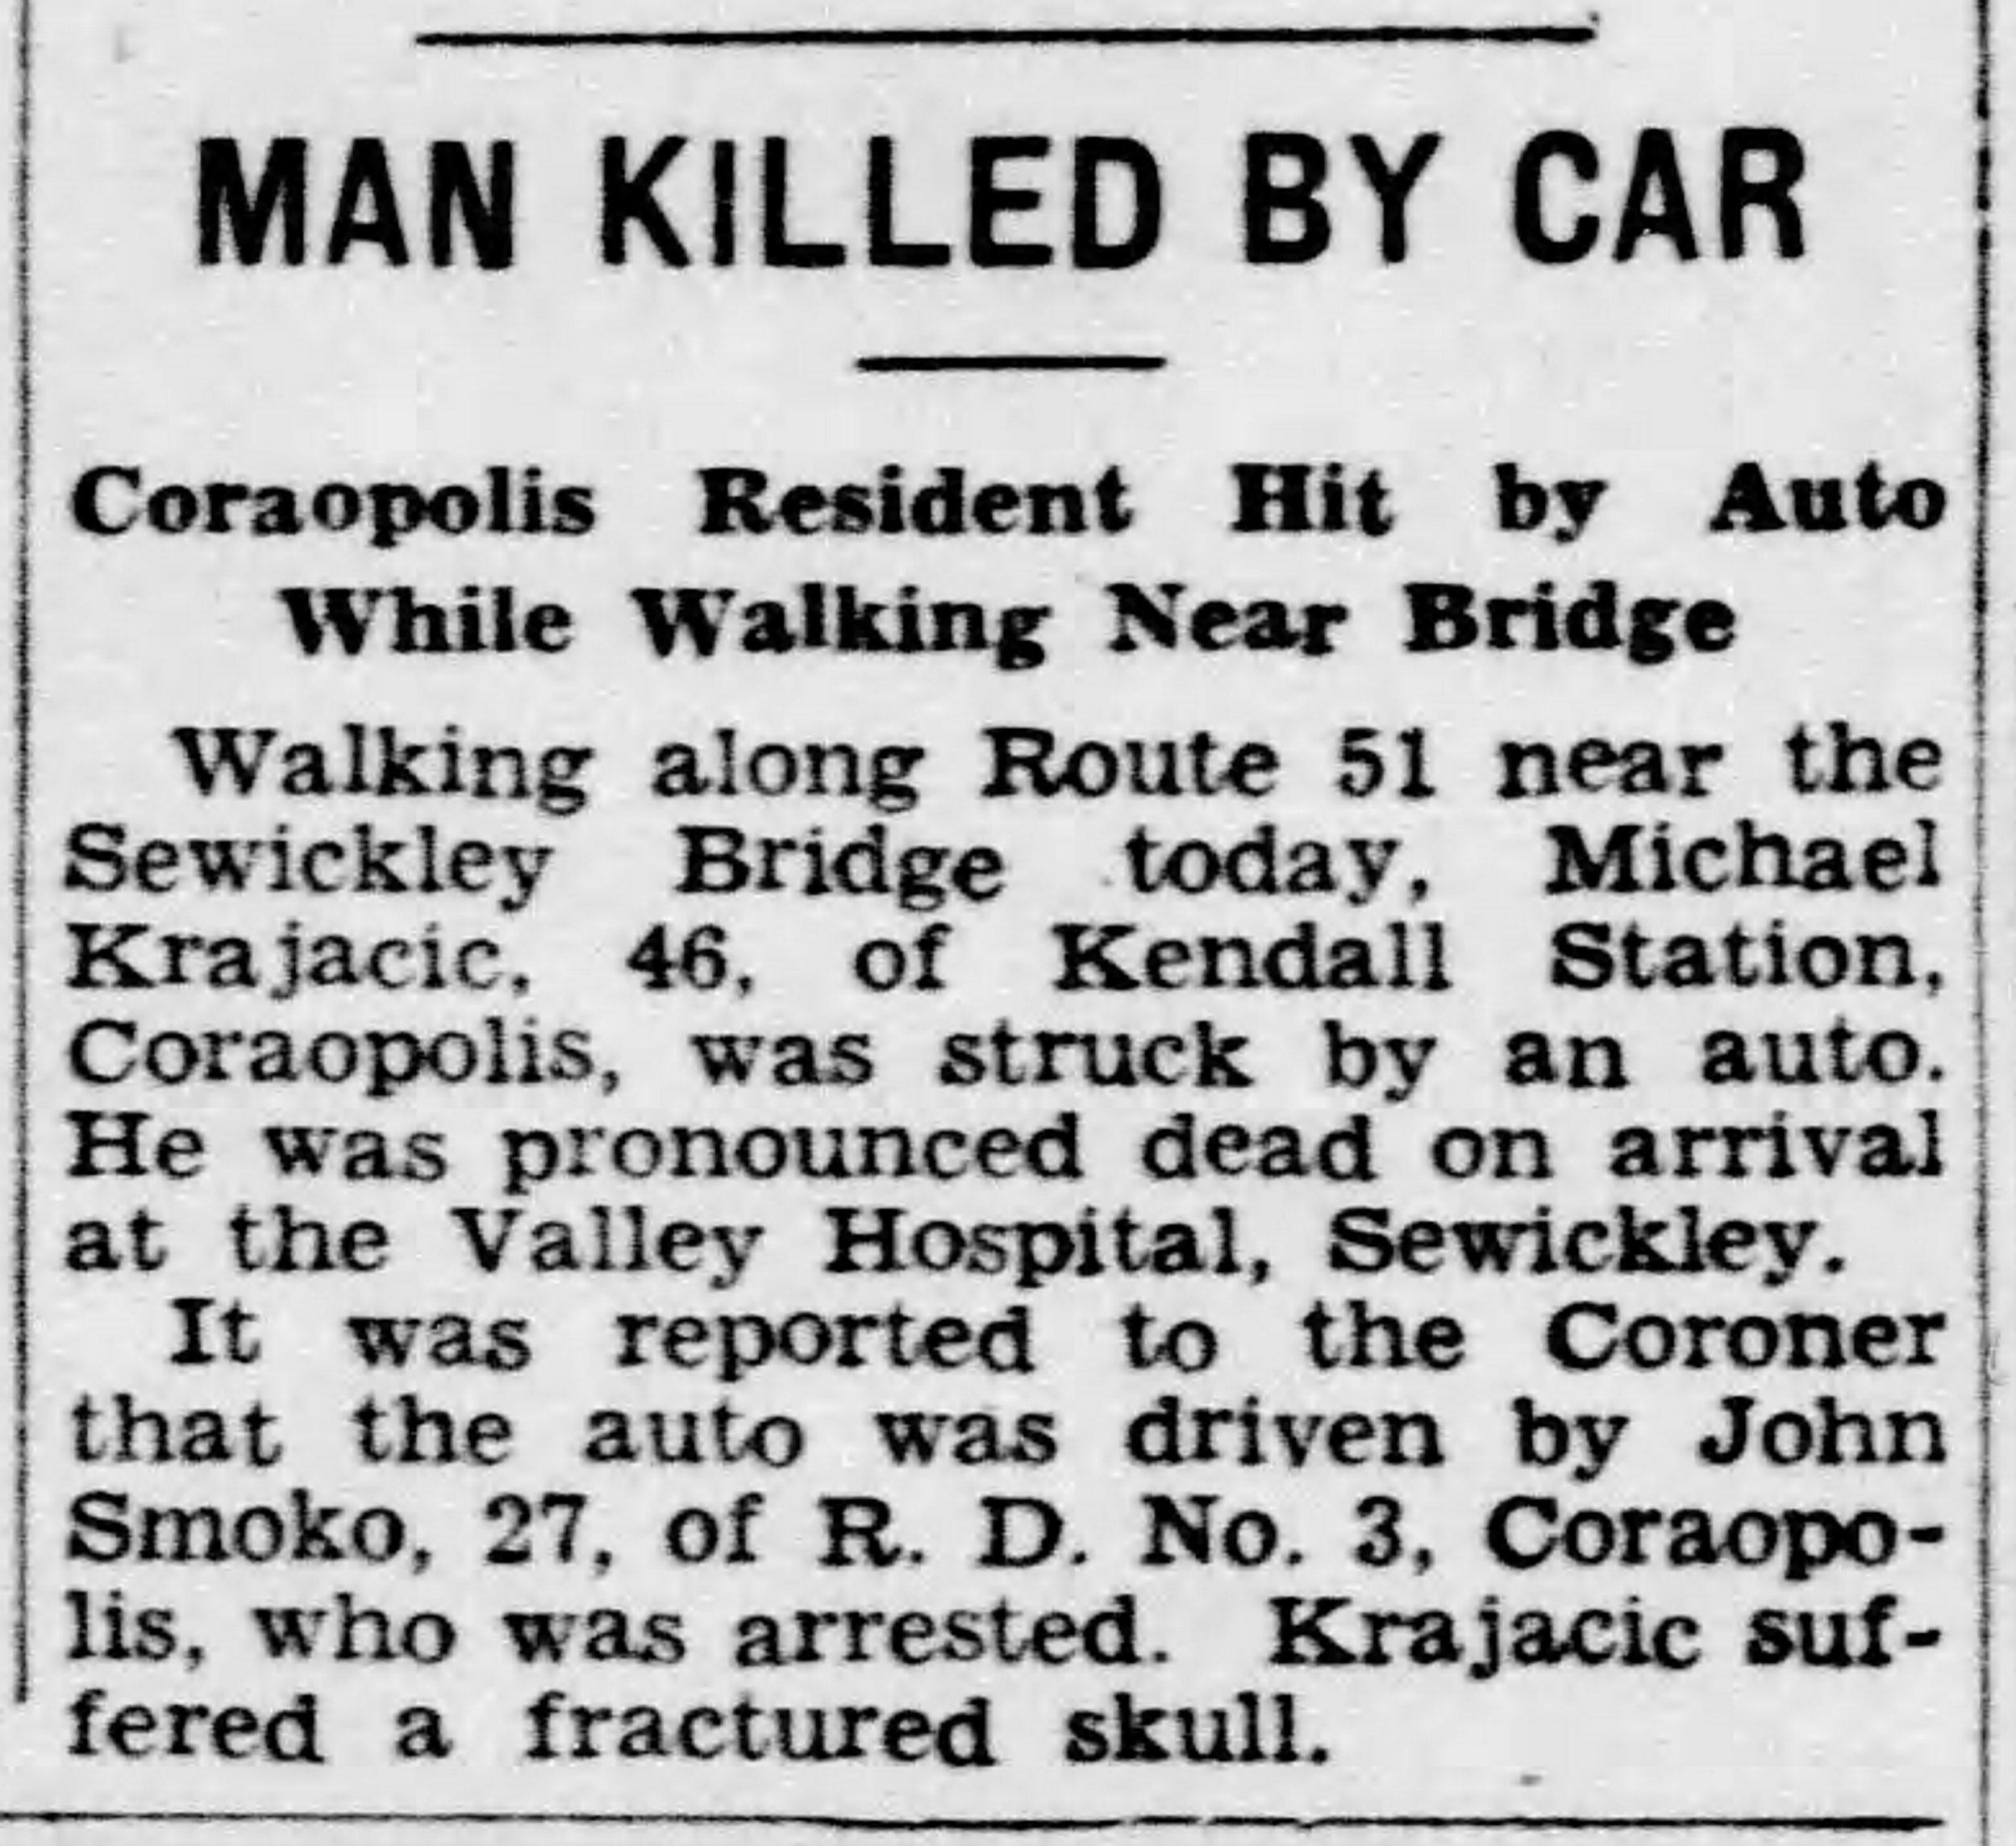 The Pittsburgh Press, April 23, 1937